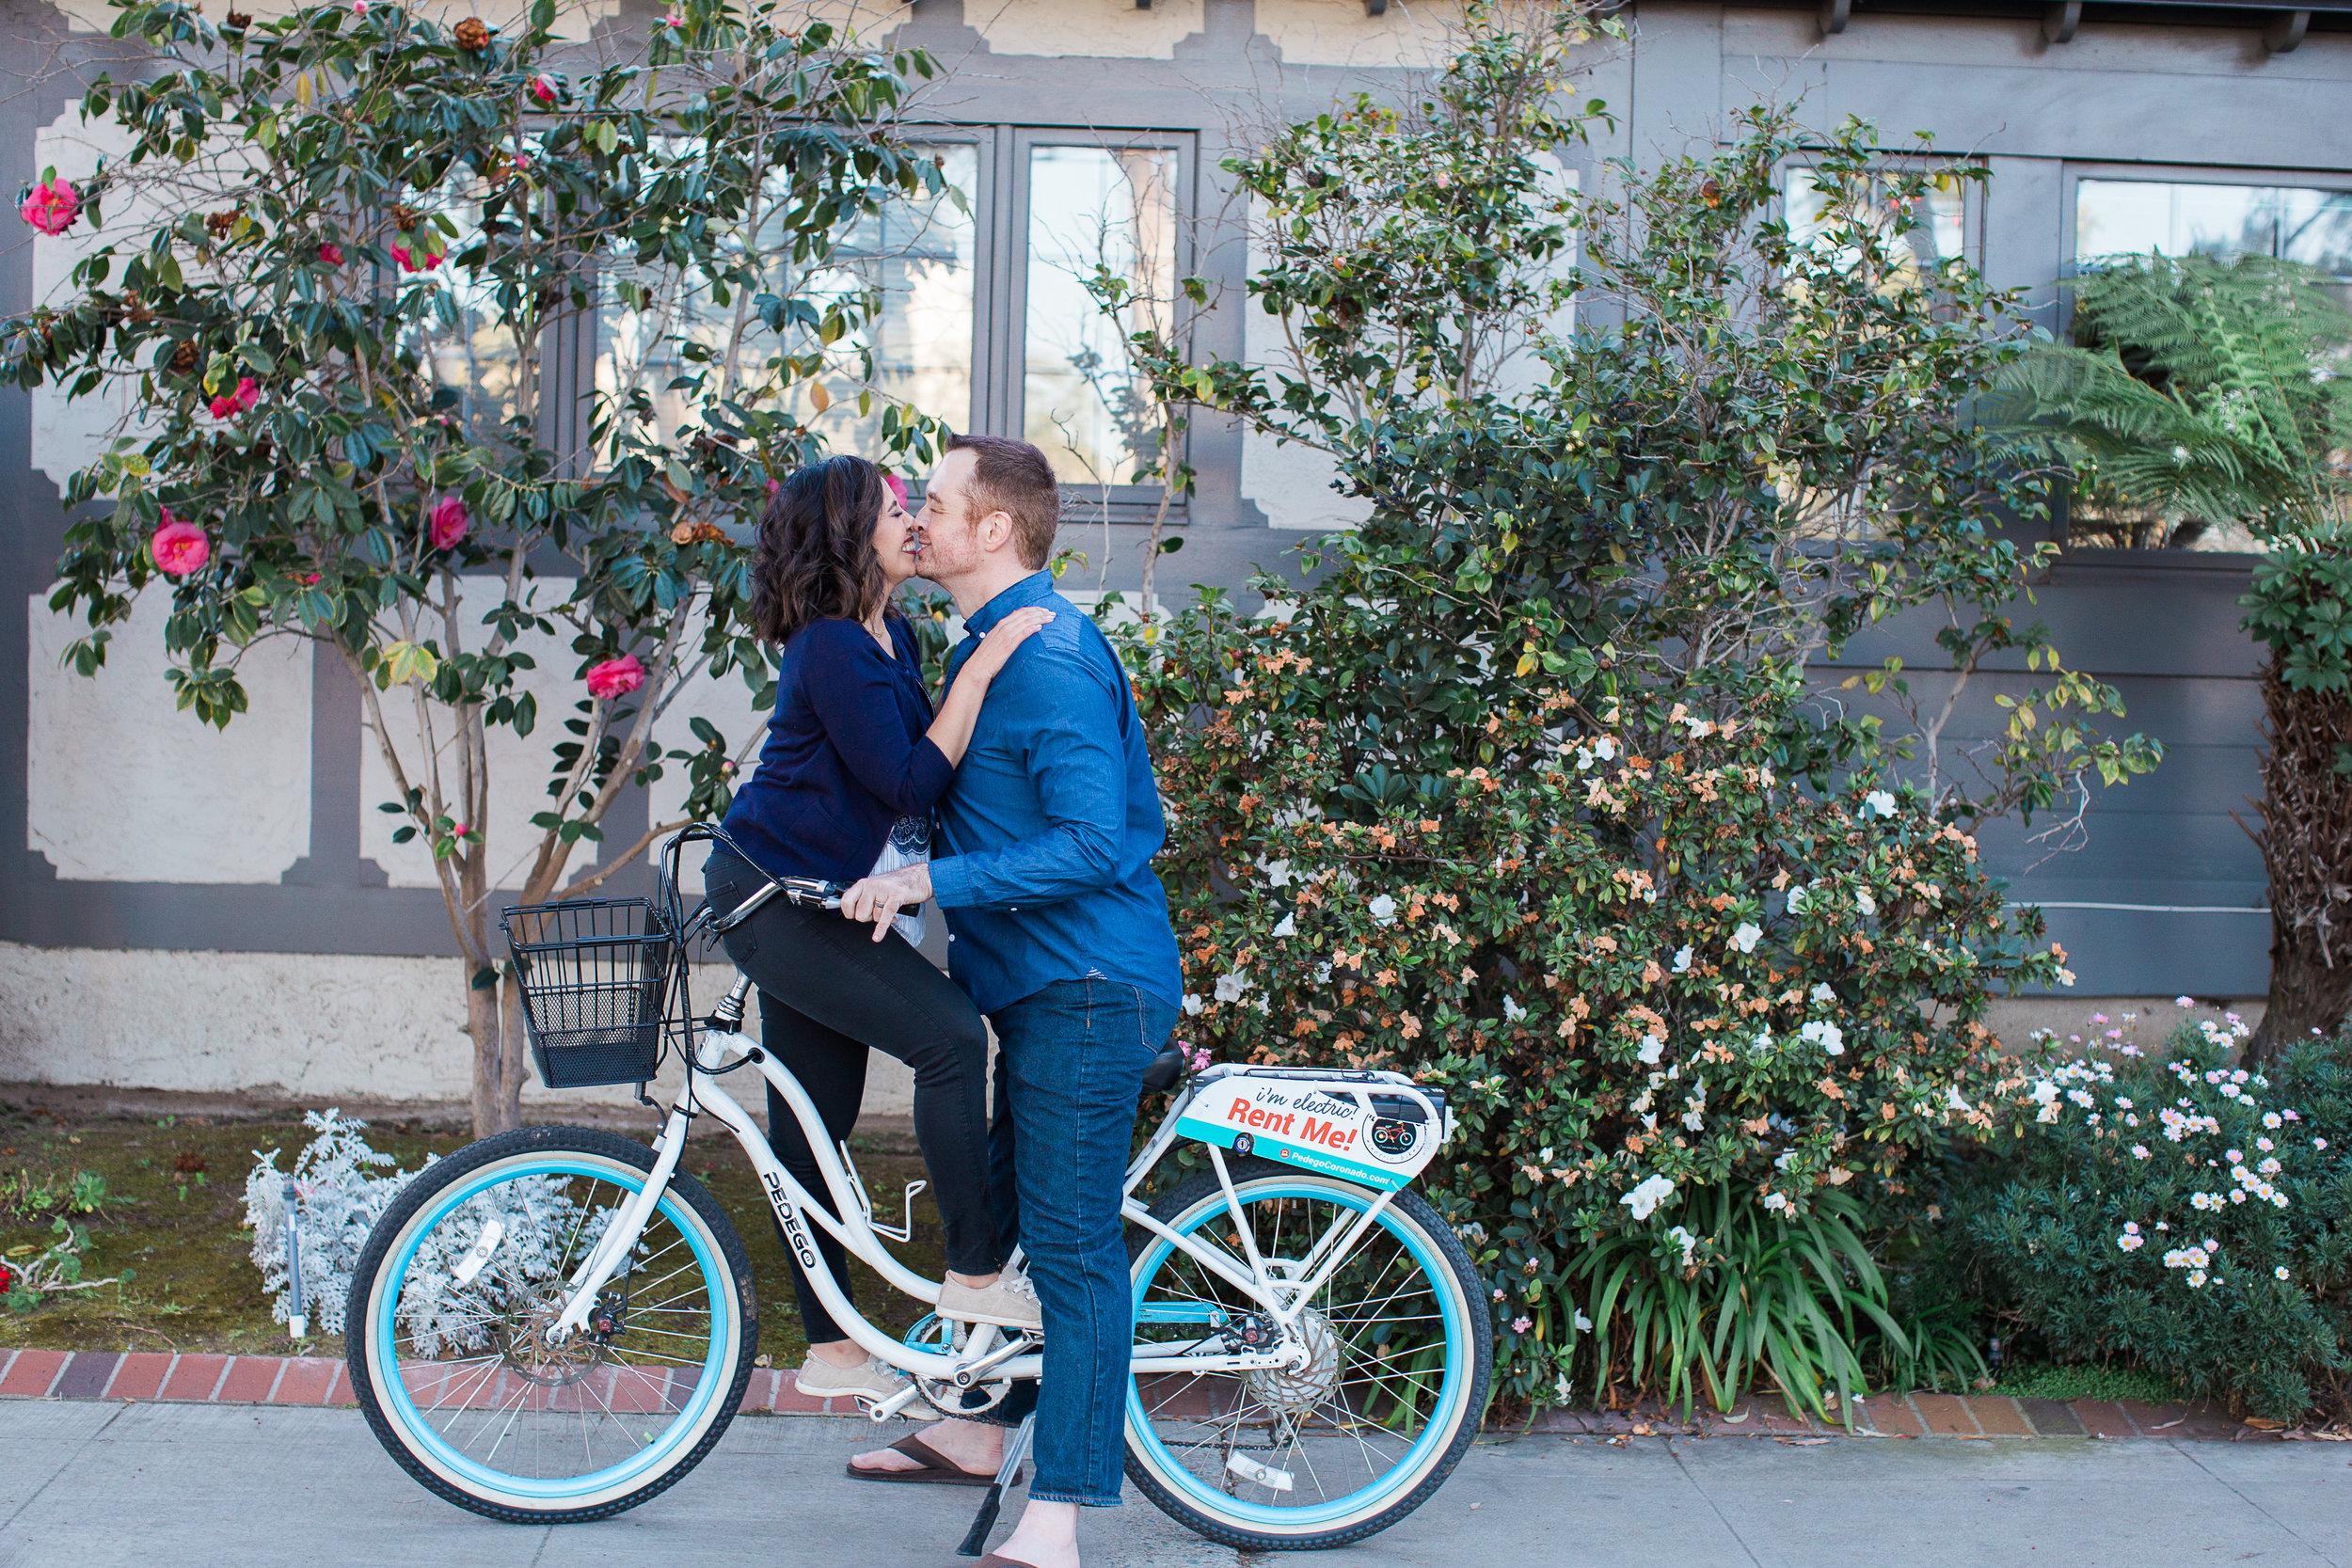 san-diego-wedding-photographer-engagement-photos-isaidyes-coronado-bride-thebay-cabrillo-sunshine(164of195).jpg